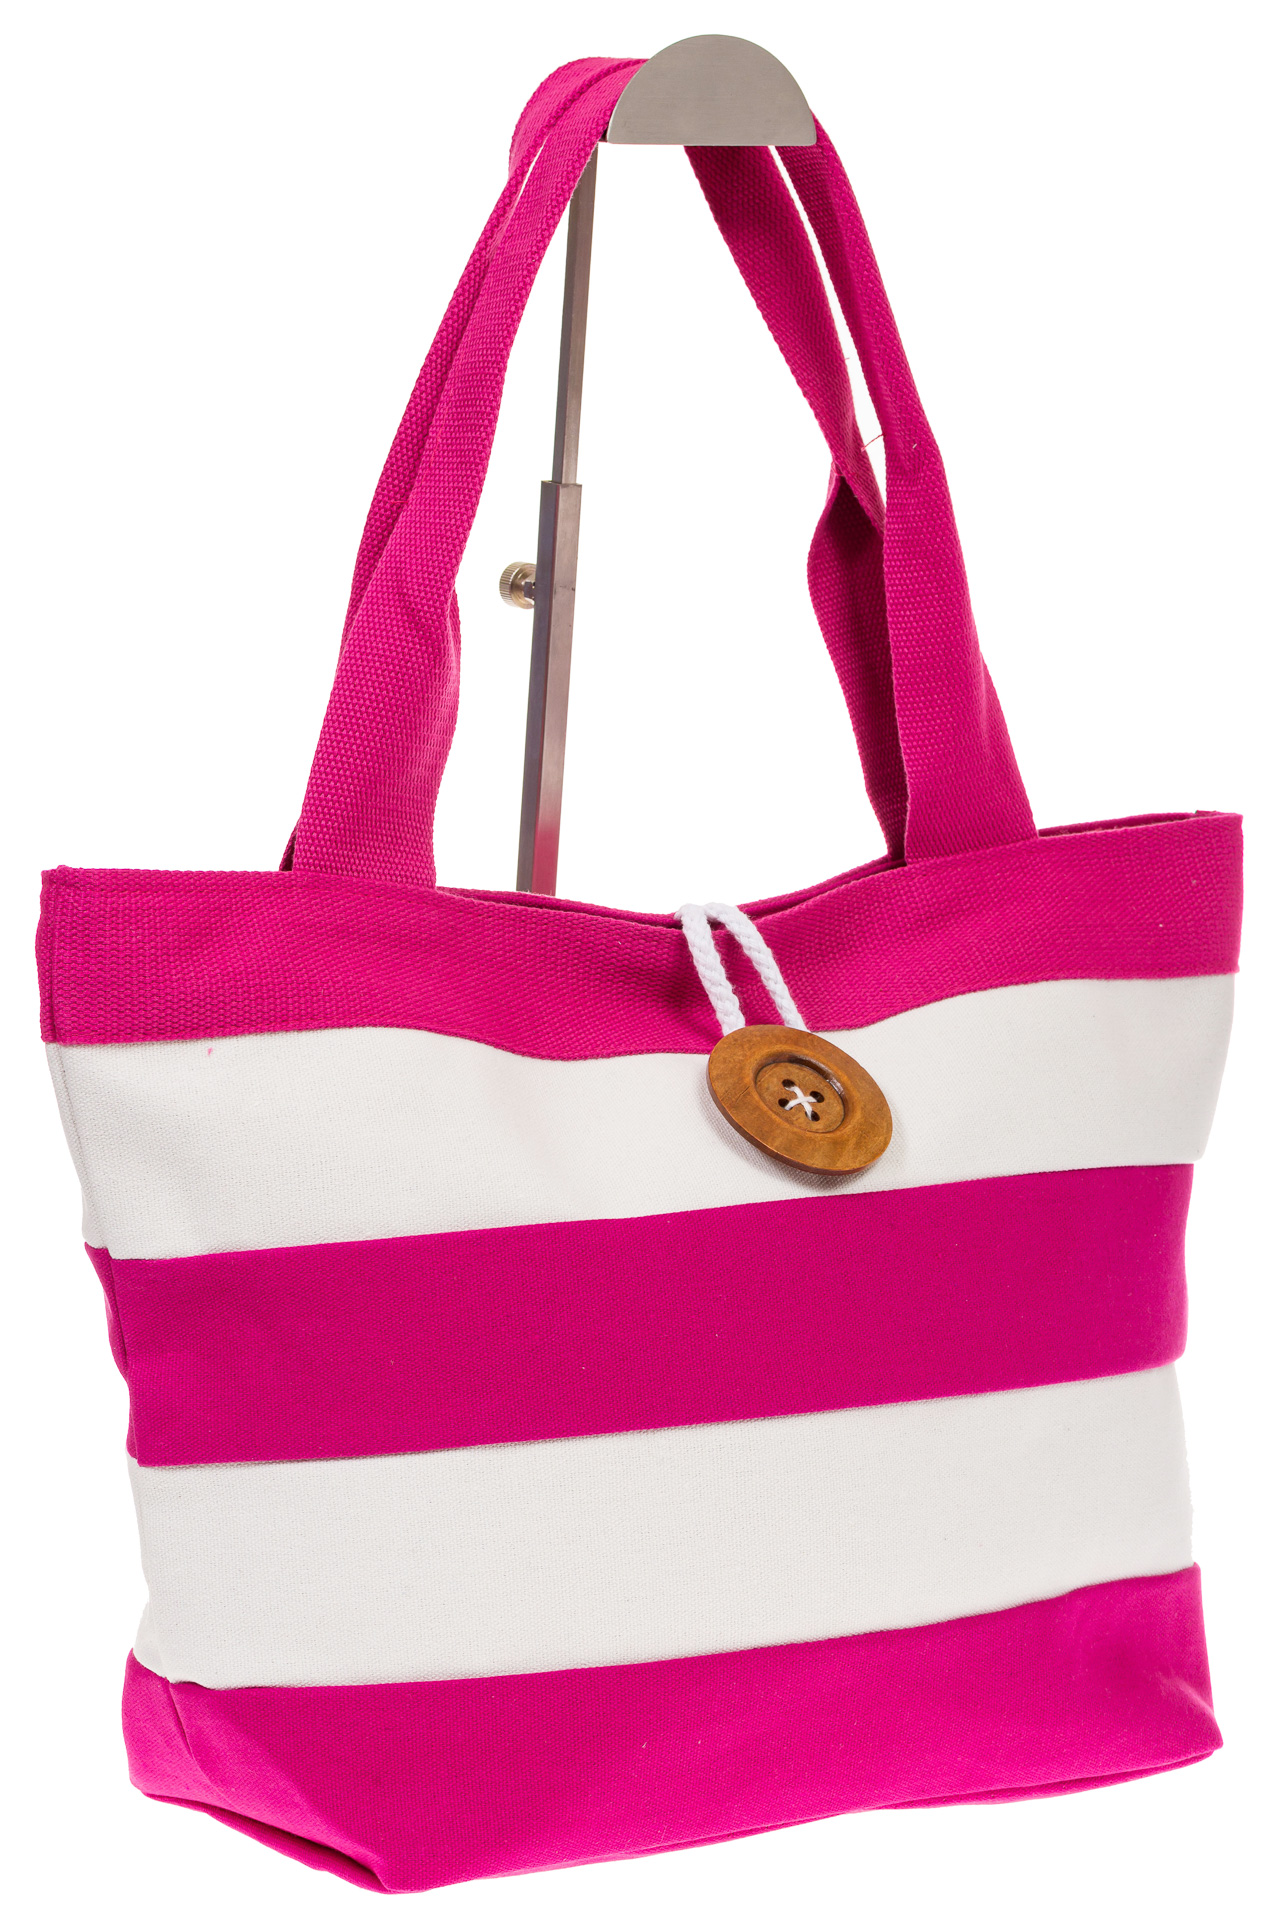 на фото Пляжная сумка в розовую и белую полоску 6216